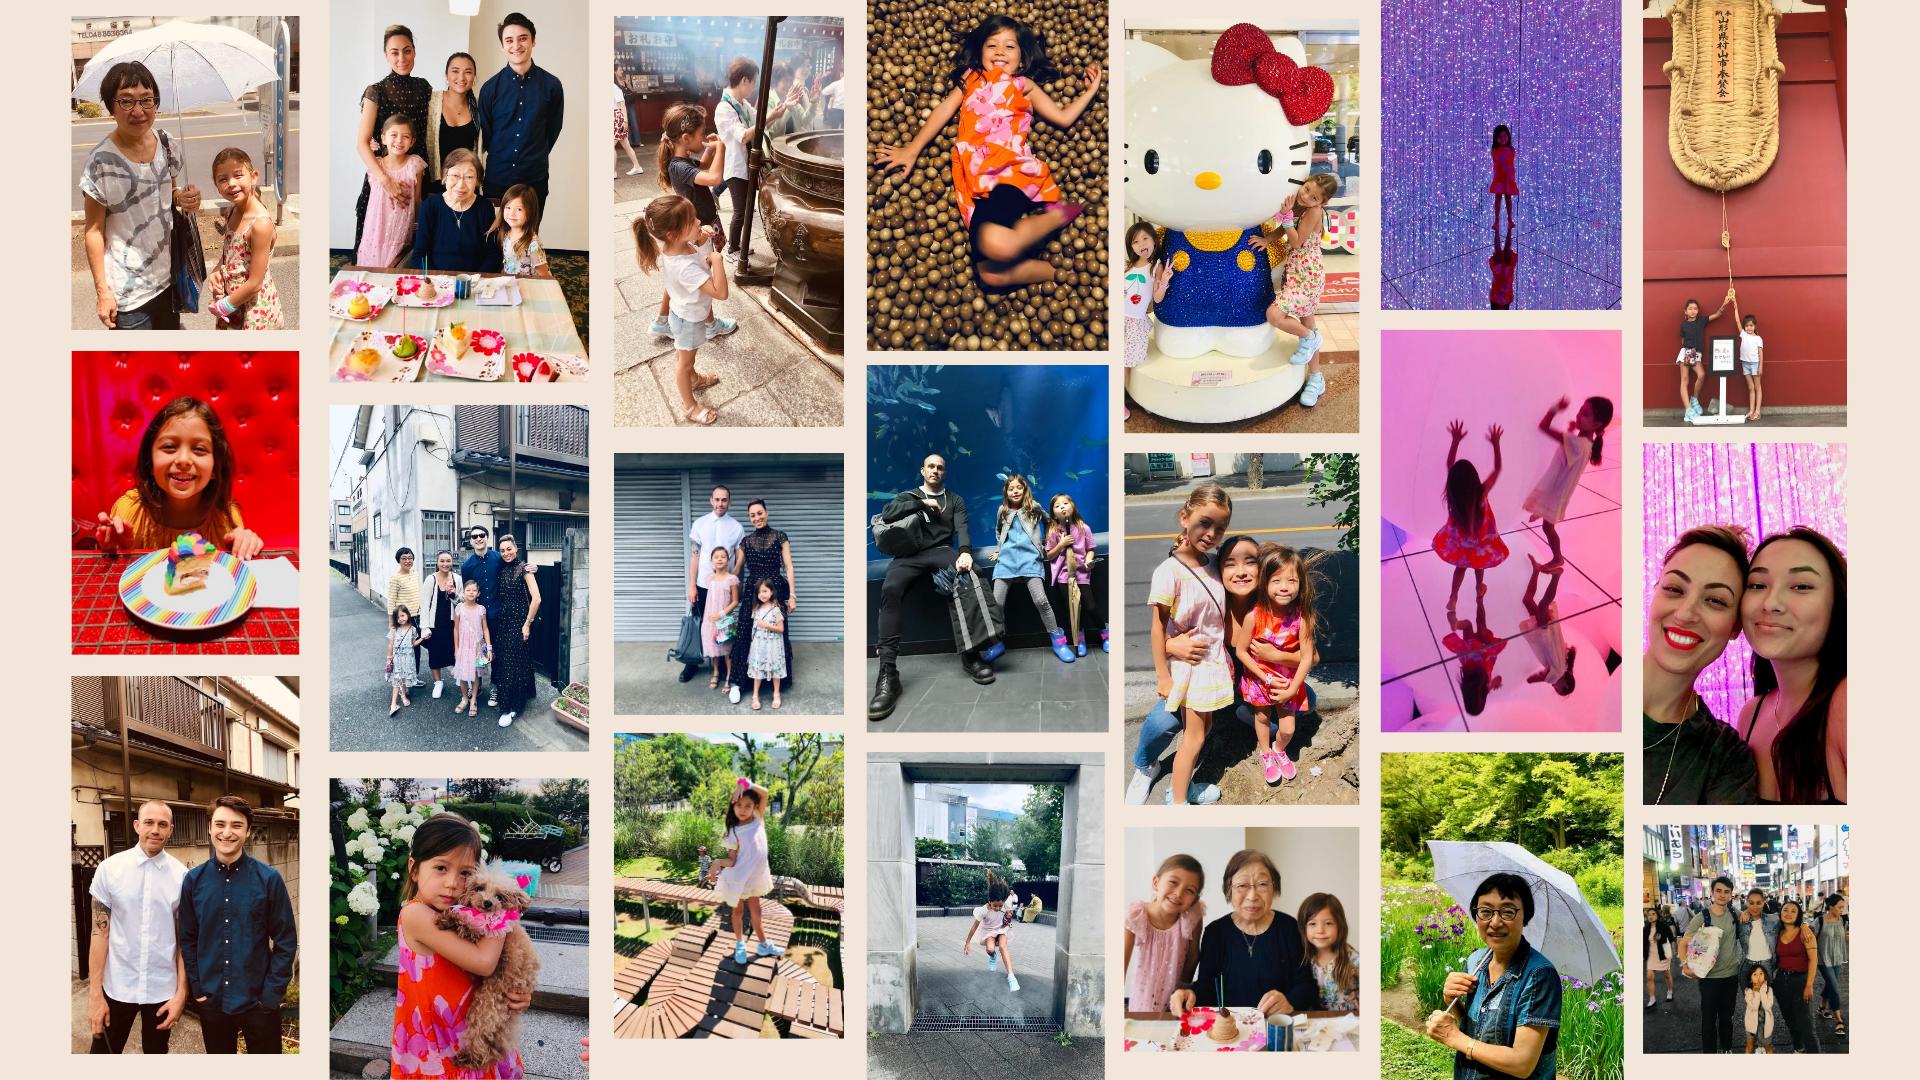 cream-adventure-collage-desktop-wallpaper.png